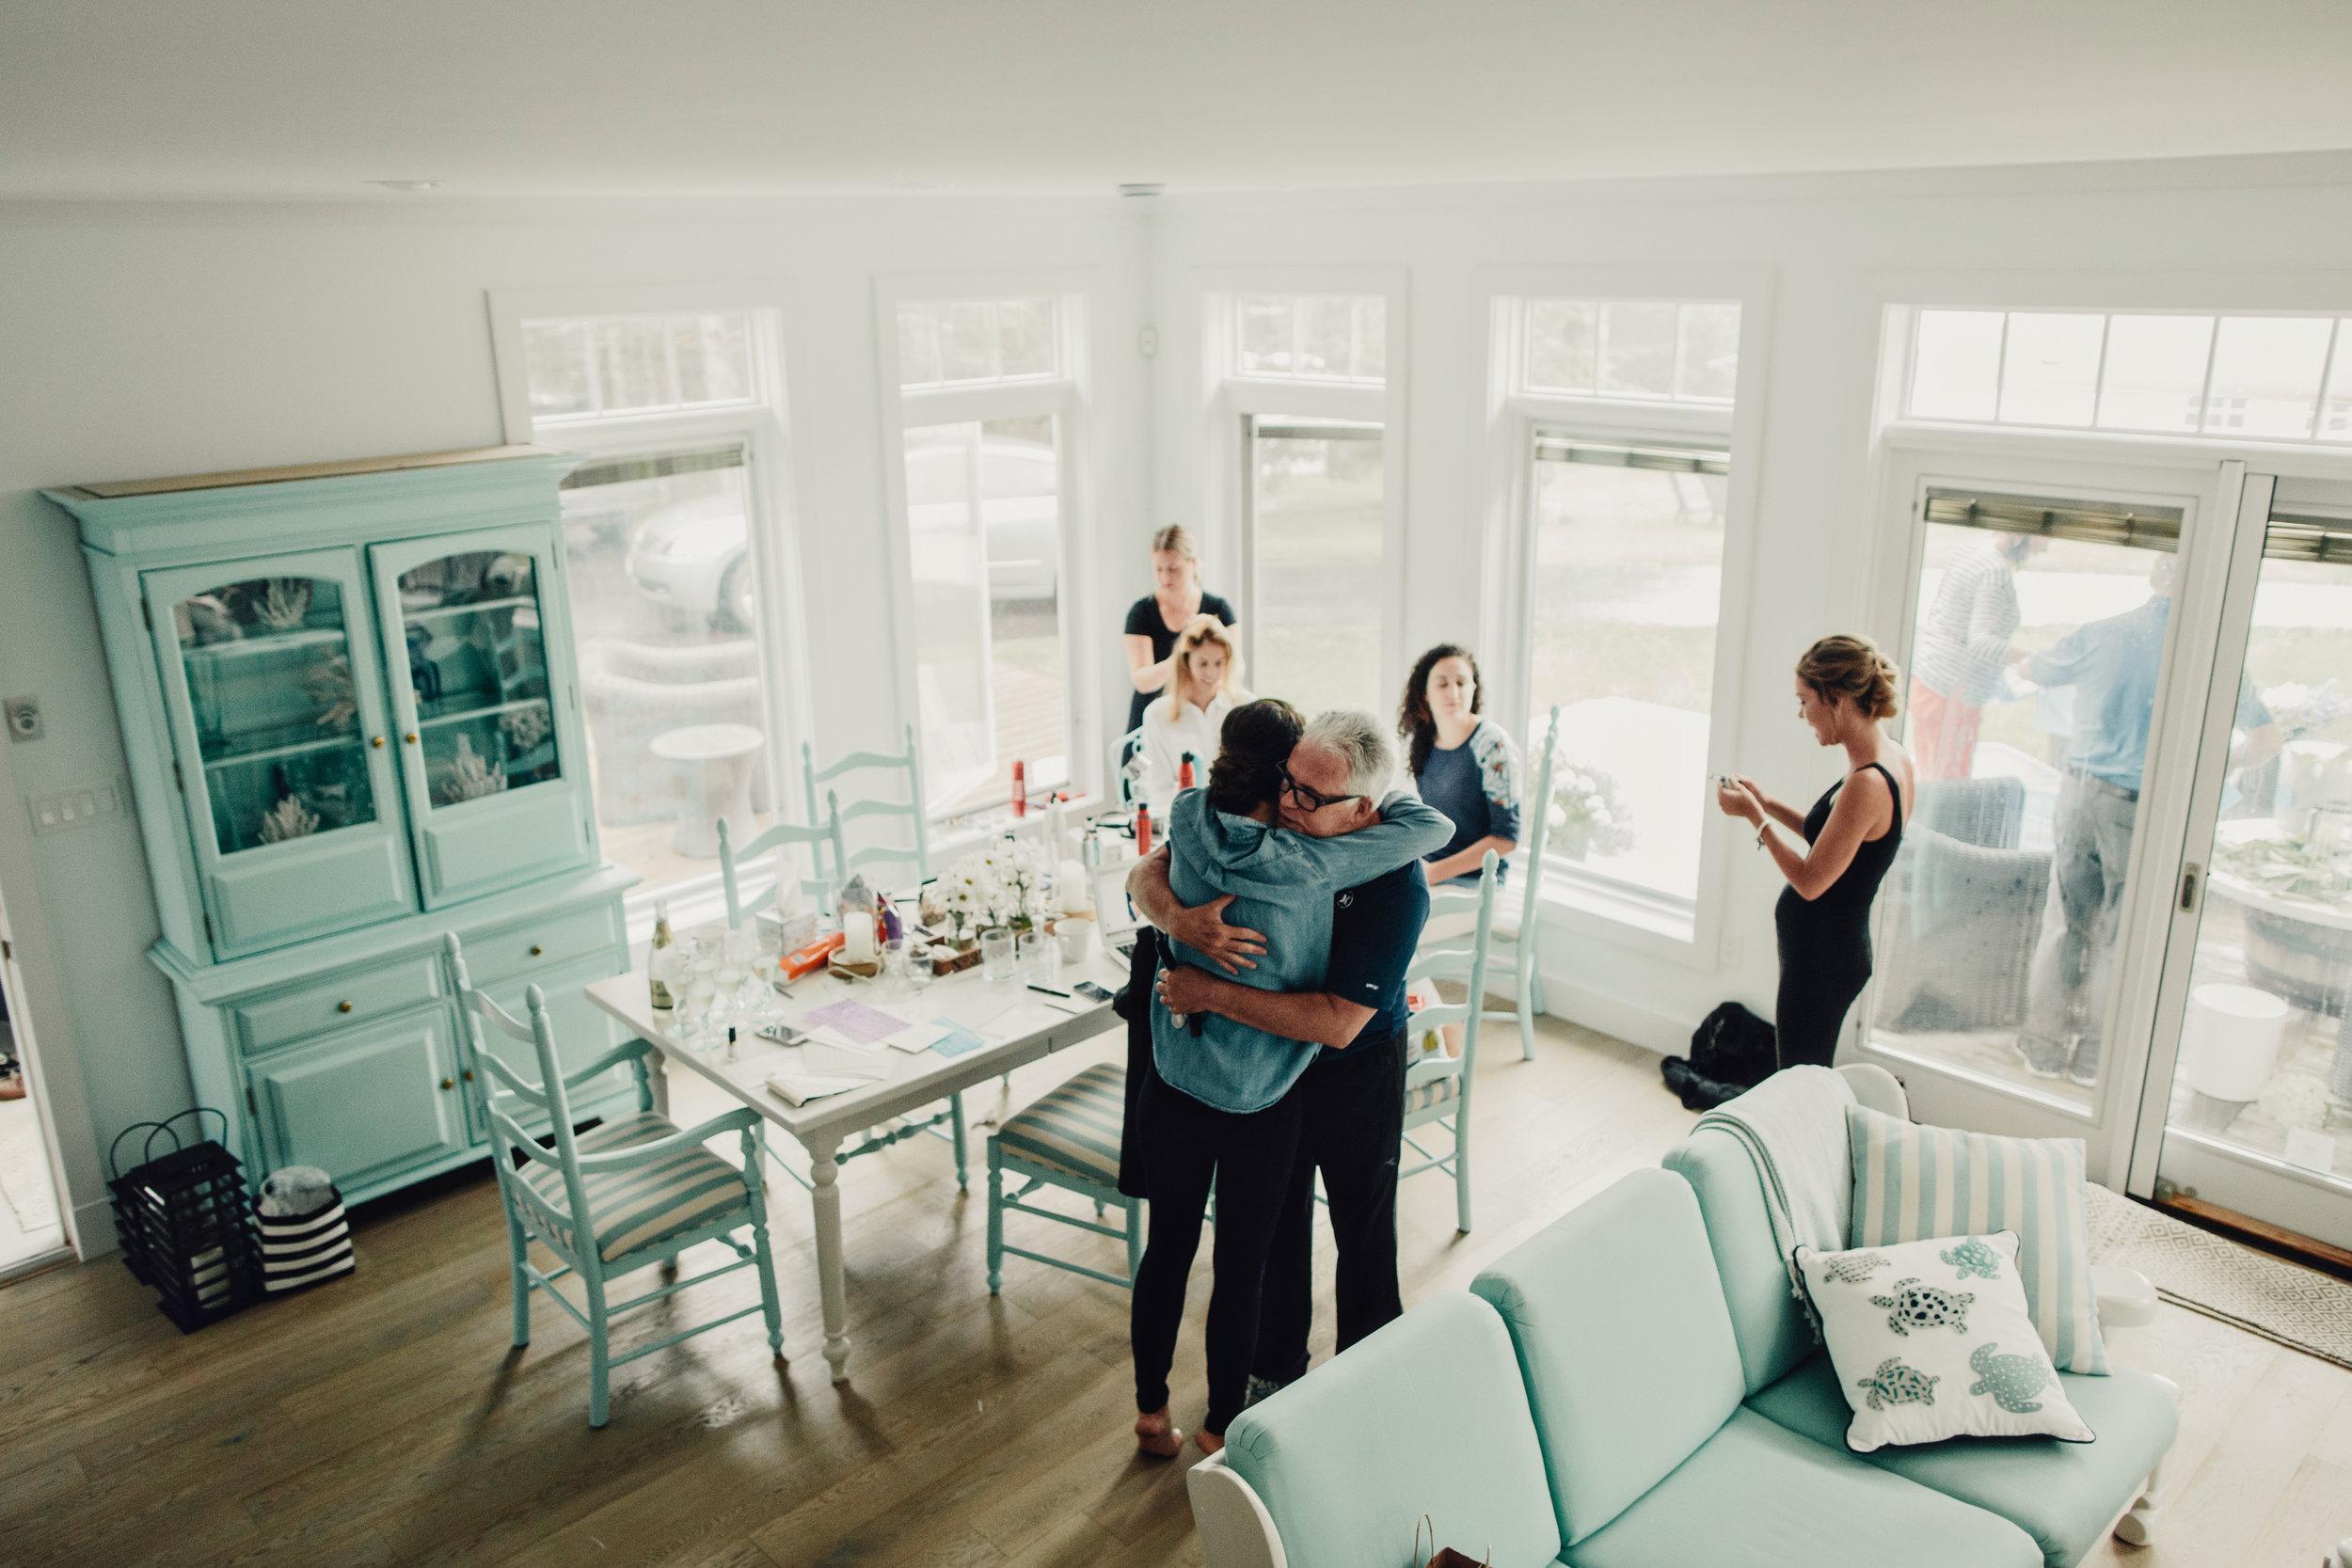 prince-edward-island-cottage-wedding-photos-0021.JPG